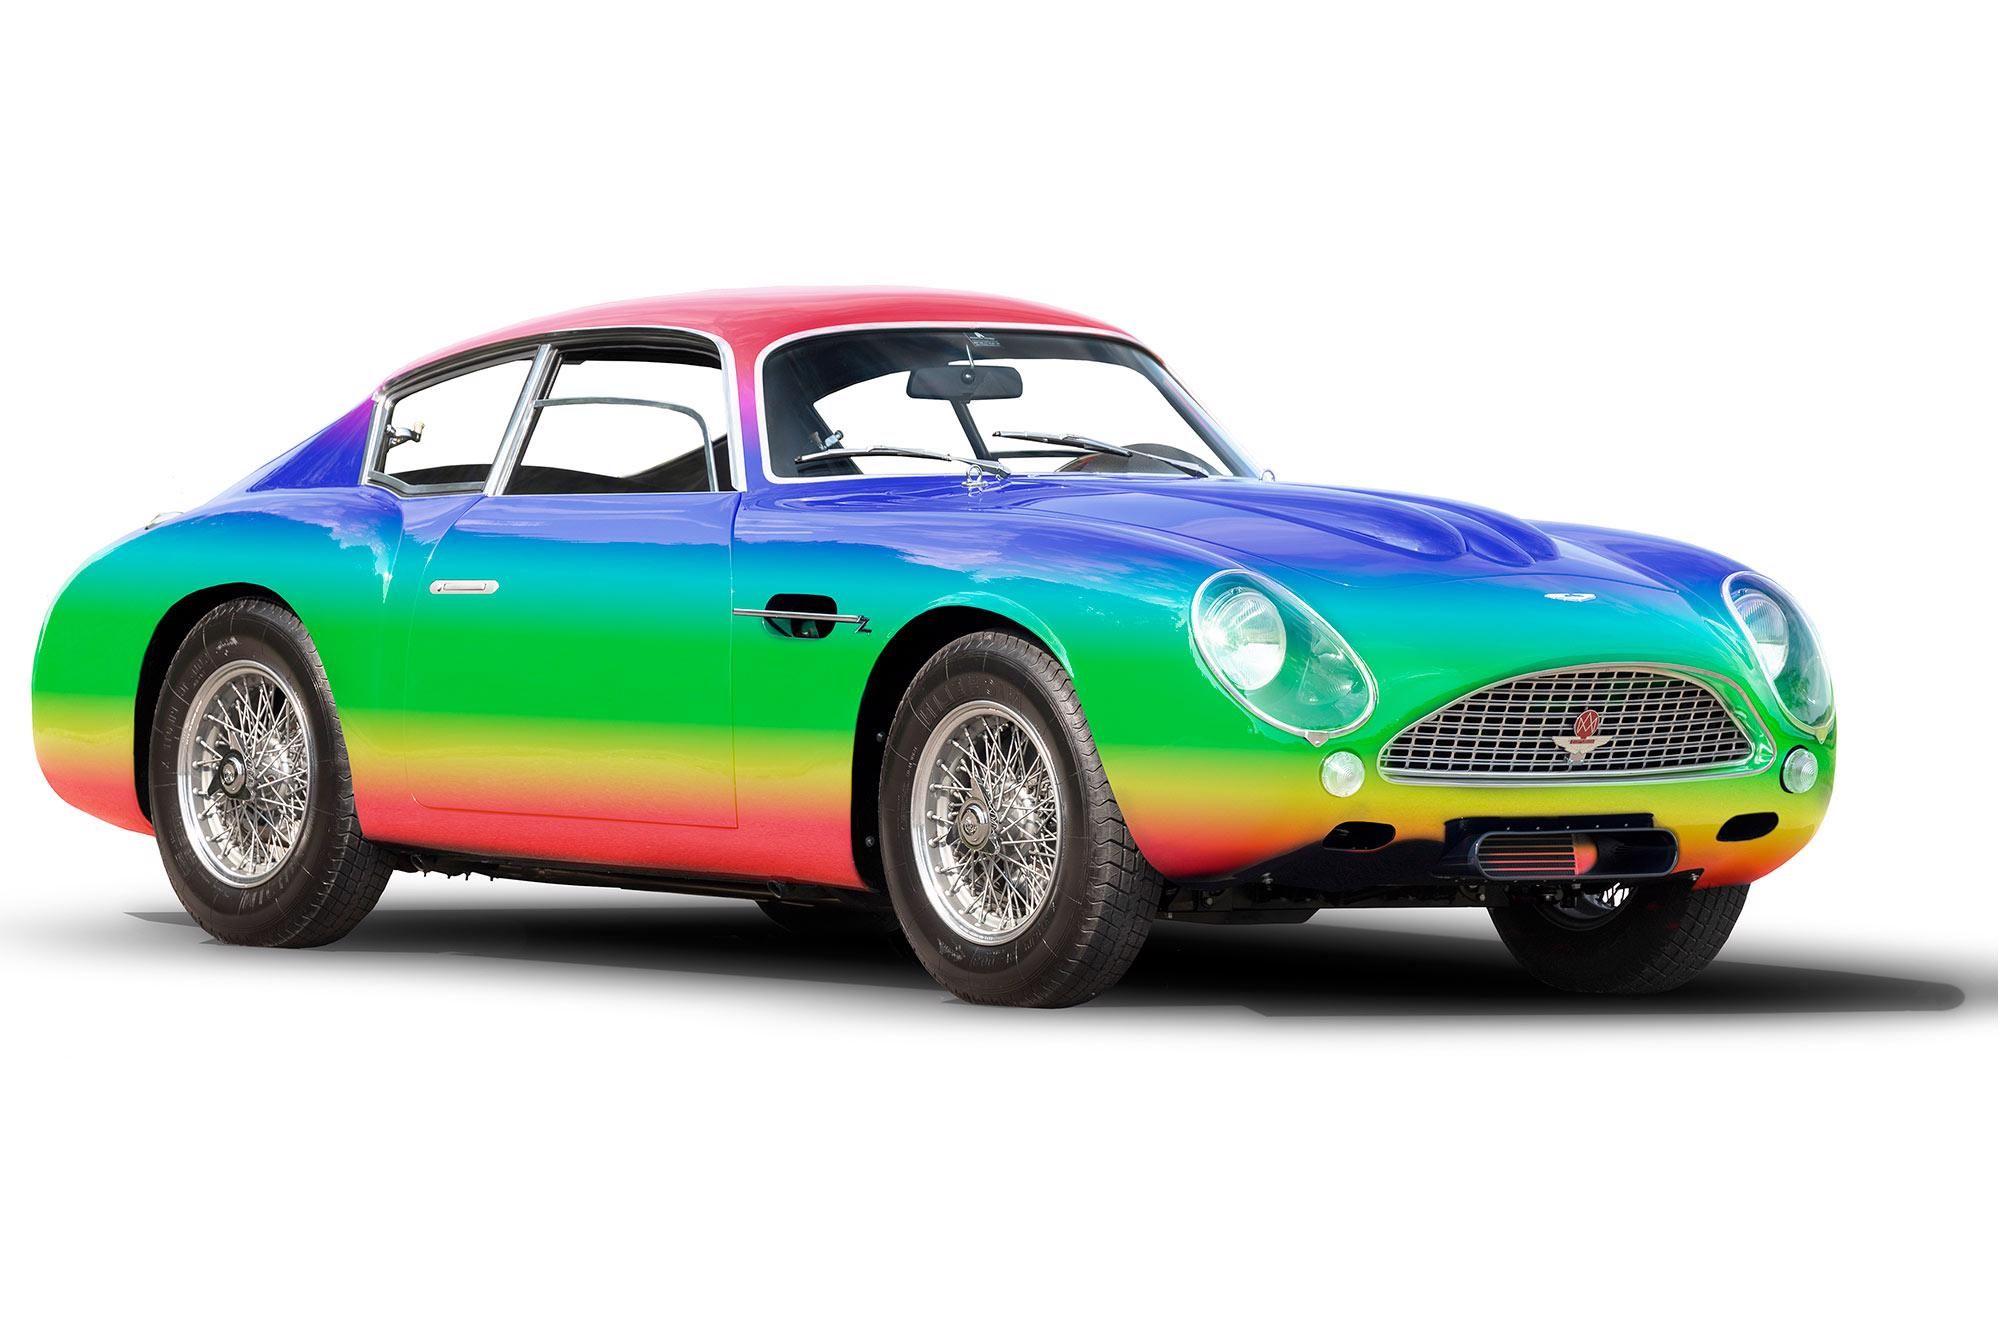 Previously Sold Aston Martins Adrian Johnson